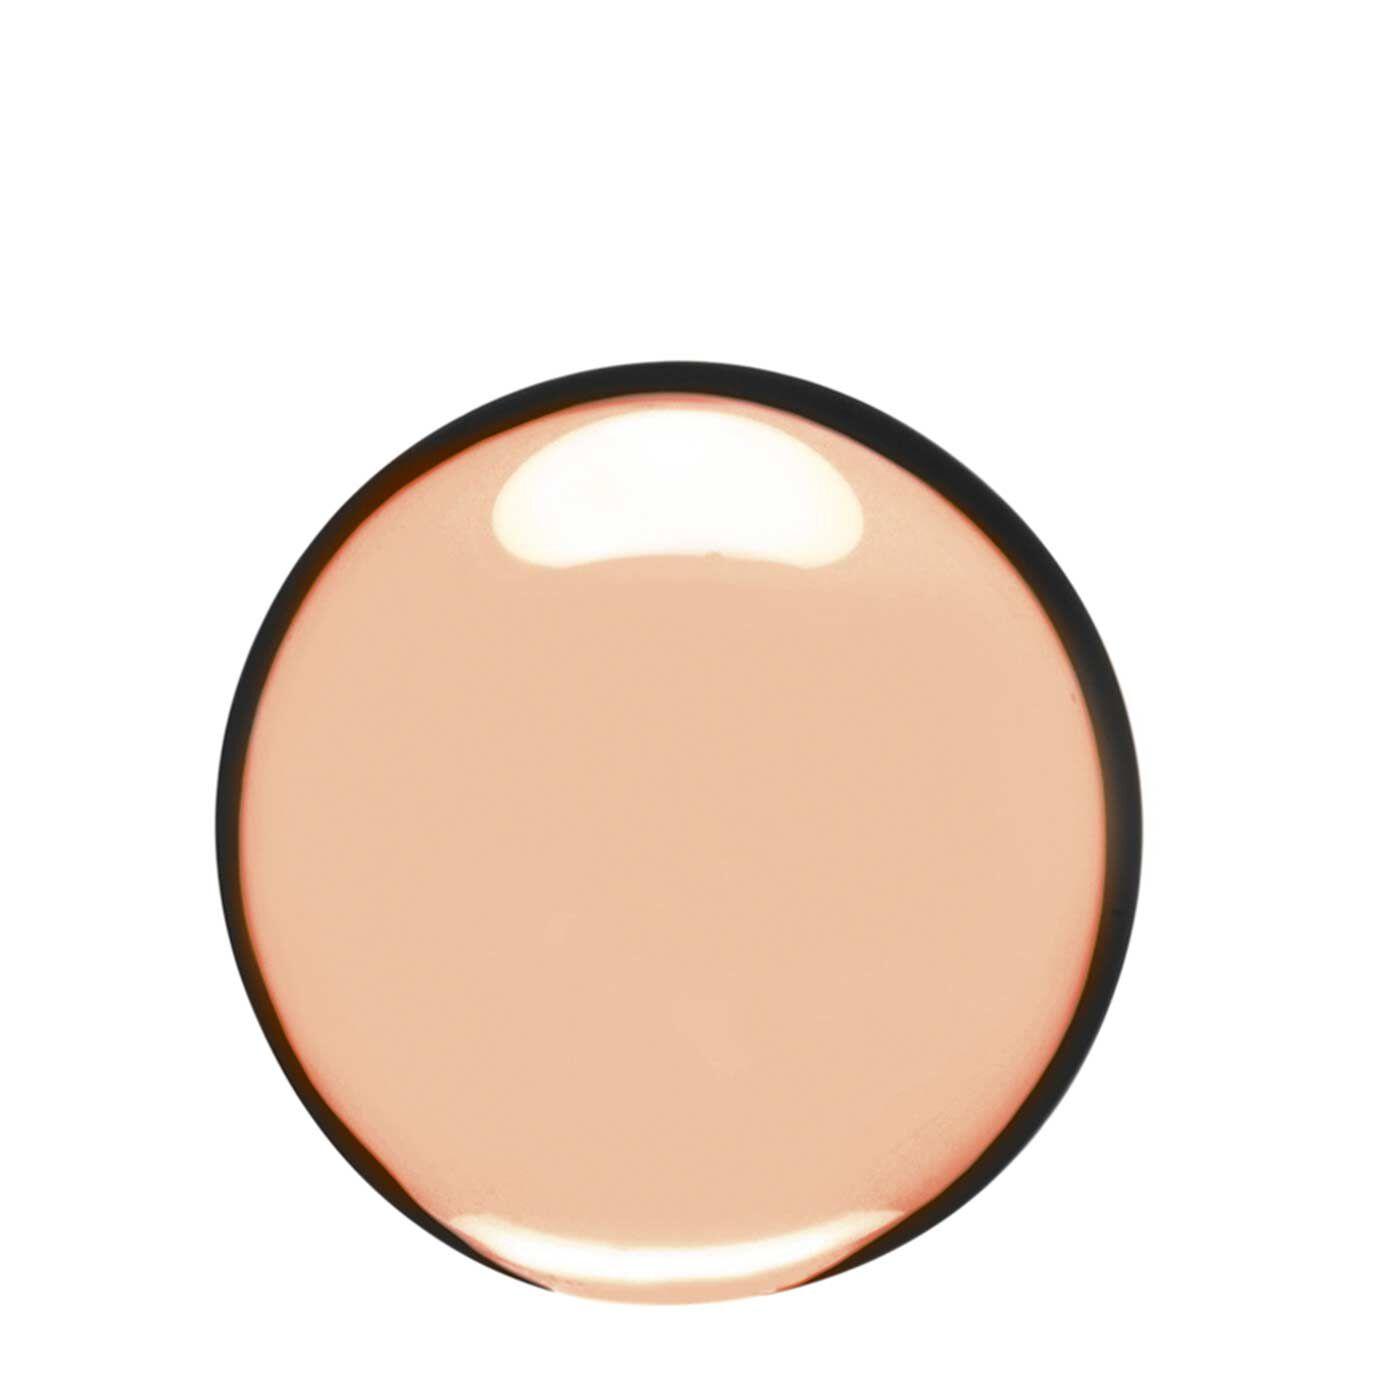 Skin%20Illusion